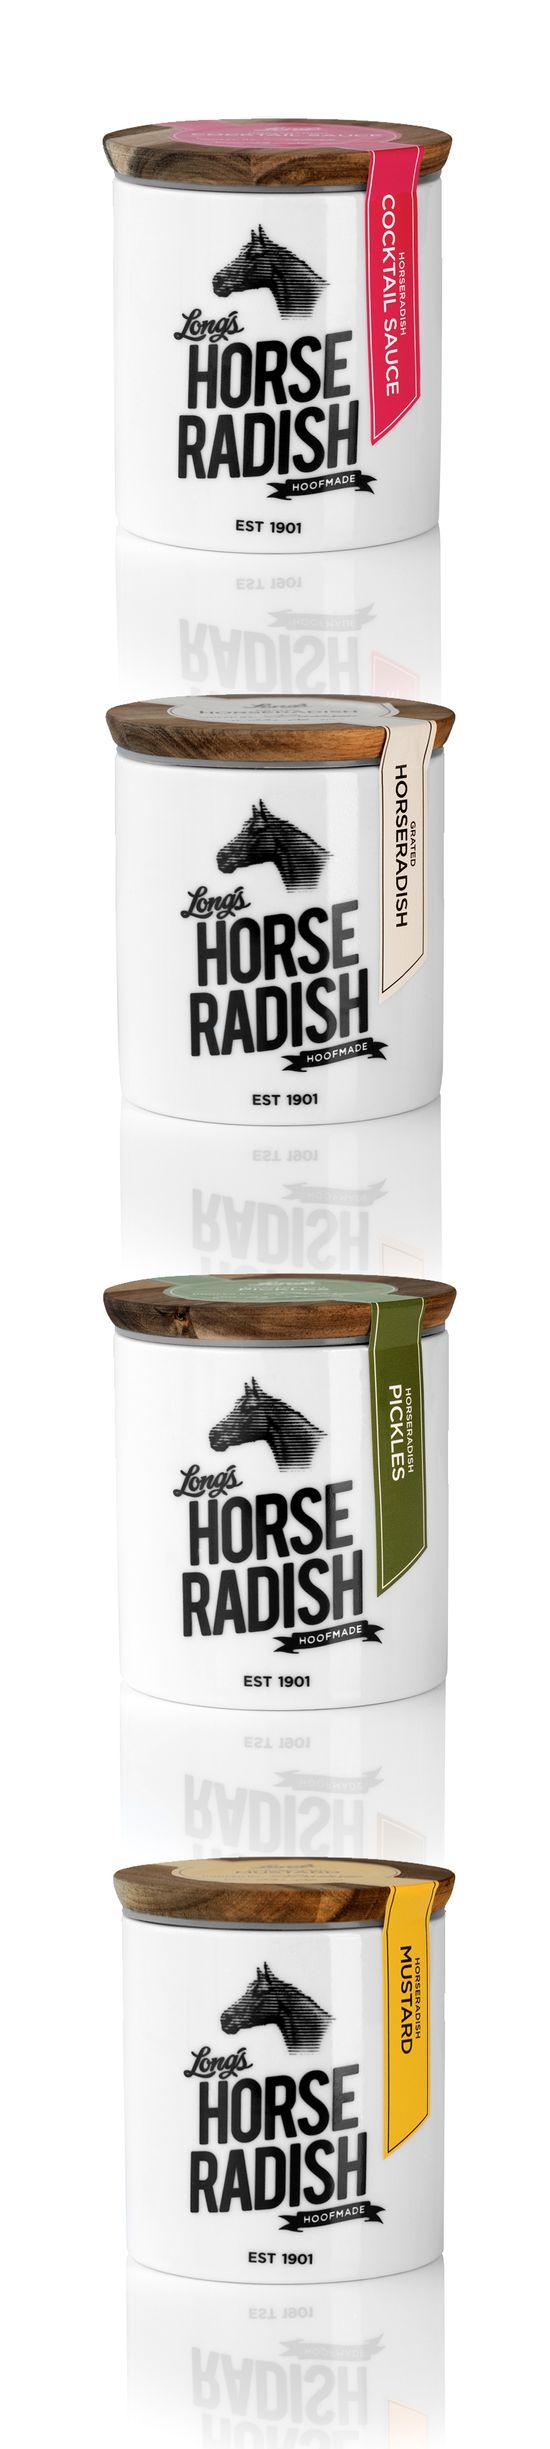 Long's Horse Radish, love!